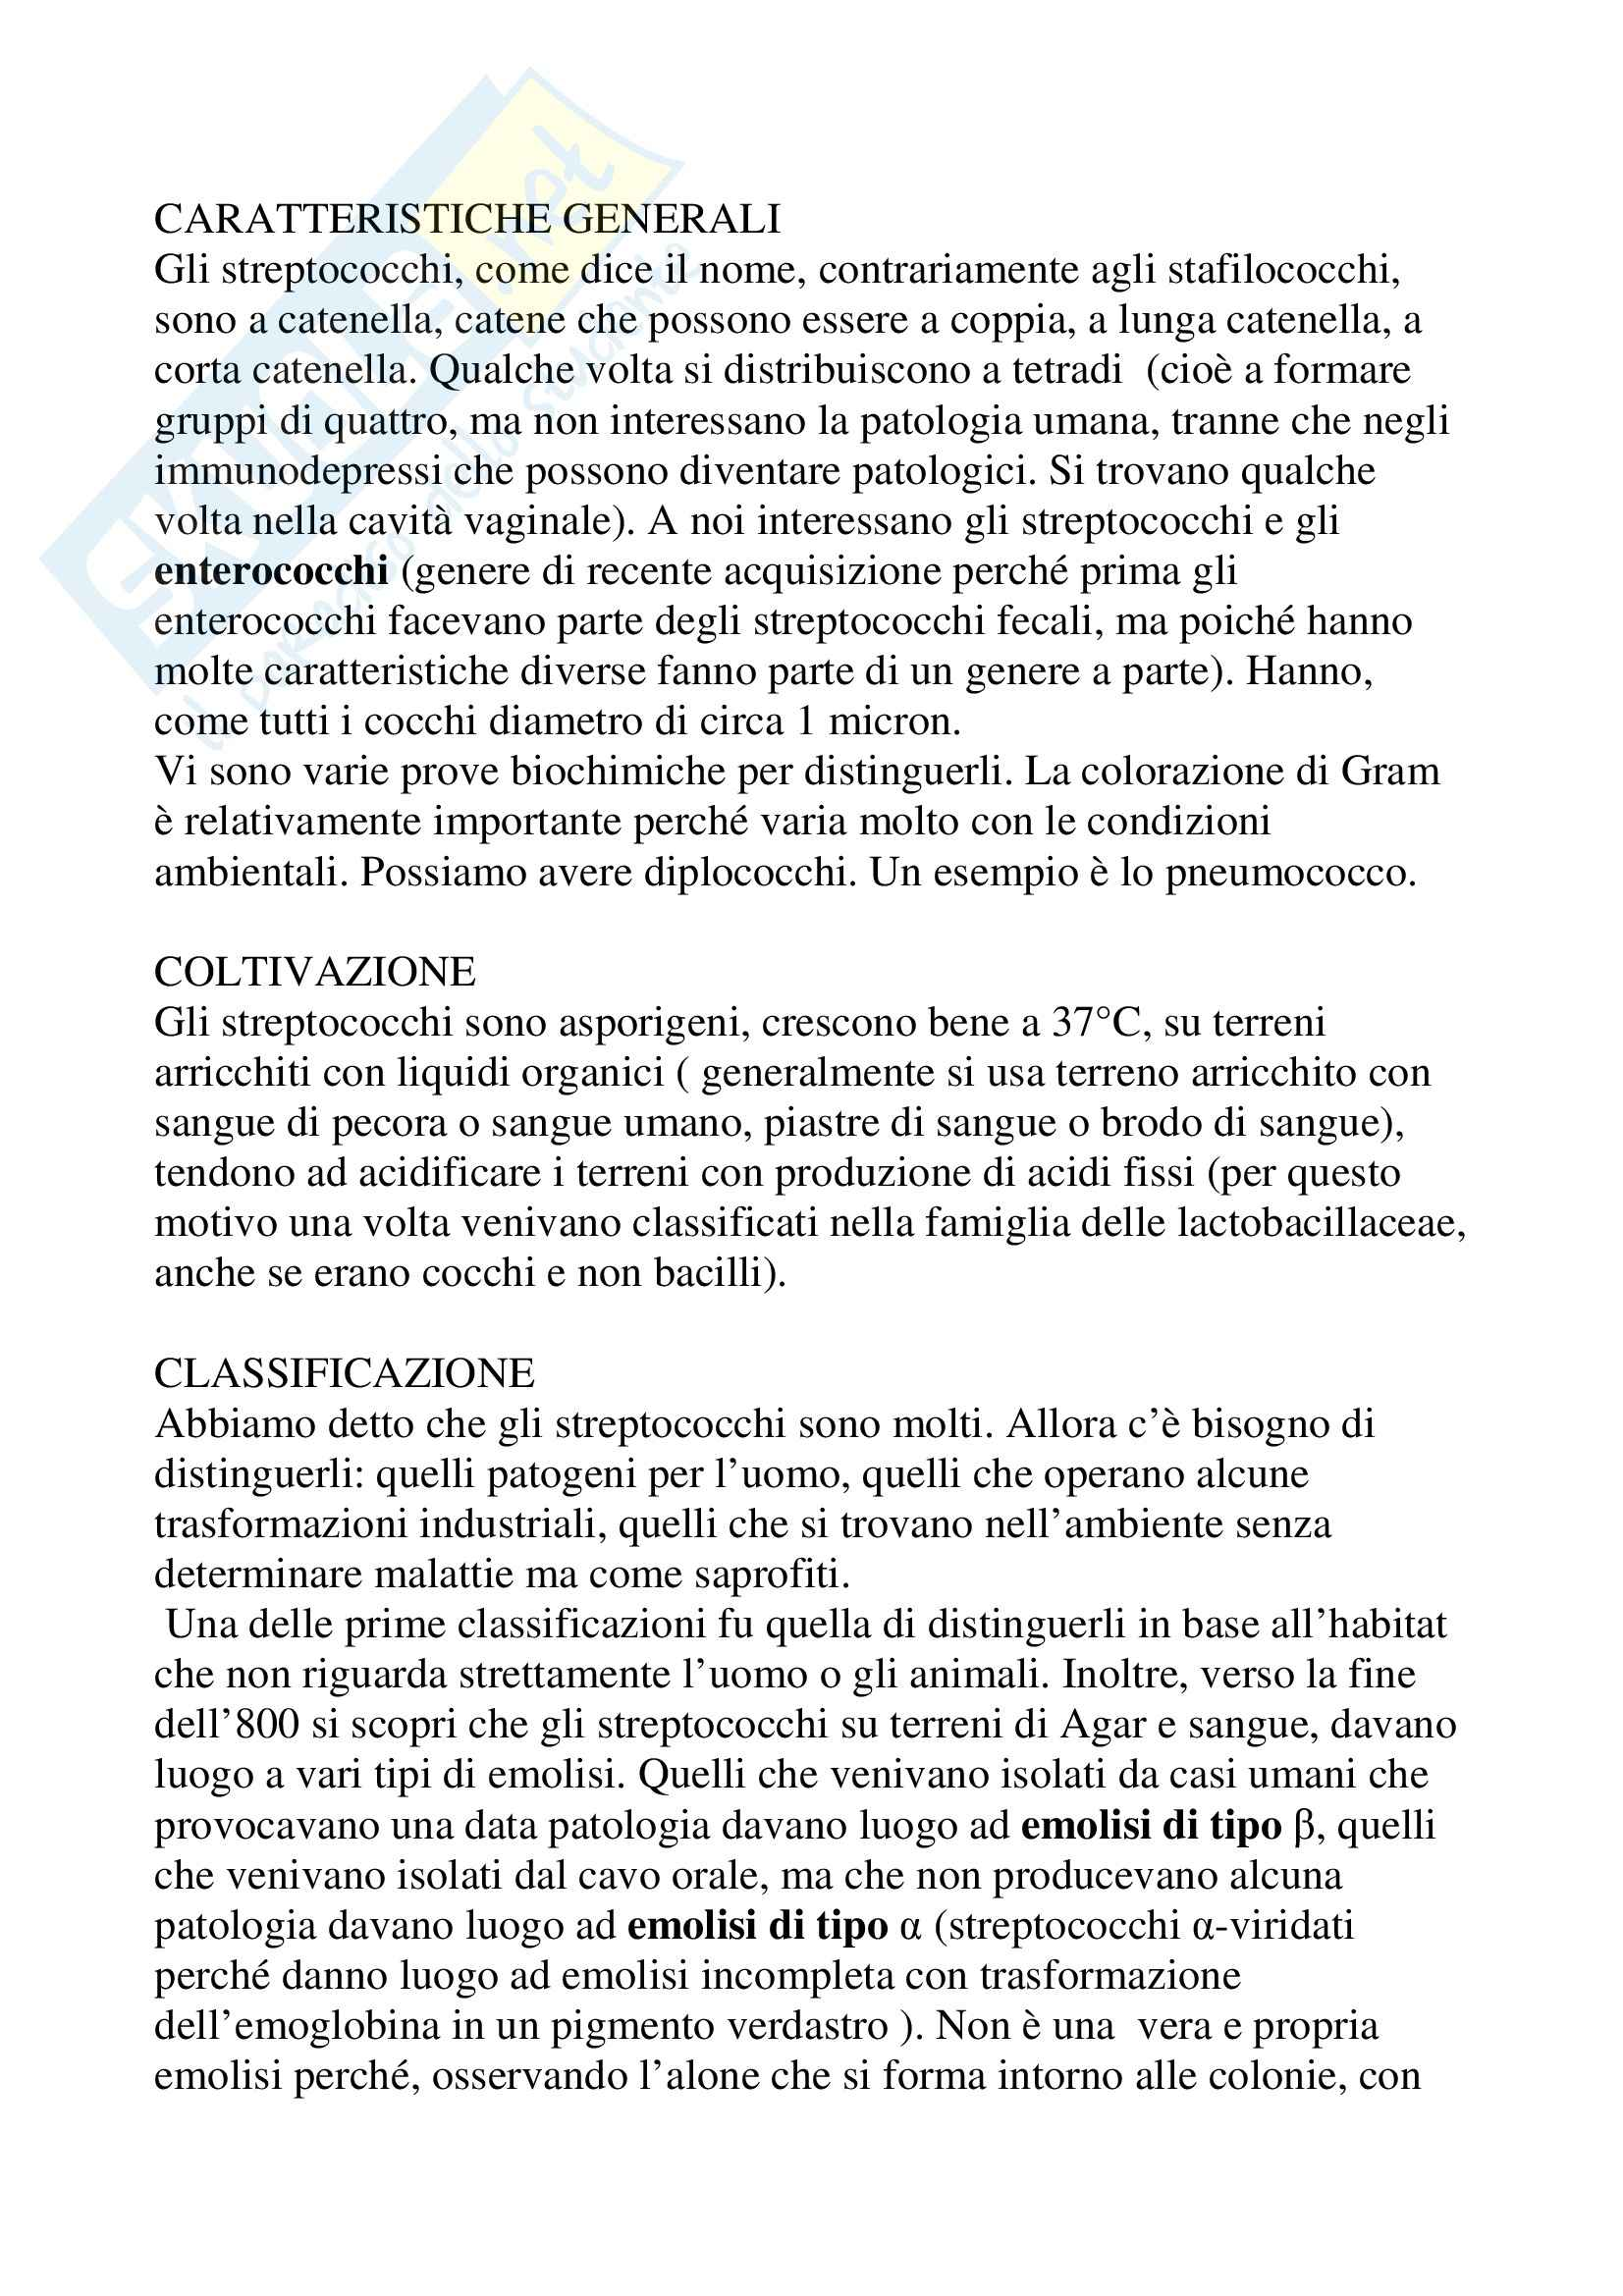 Microbiologia - streptococchi Pag. 2